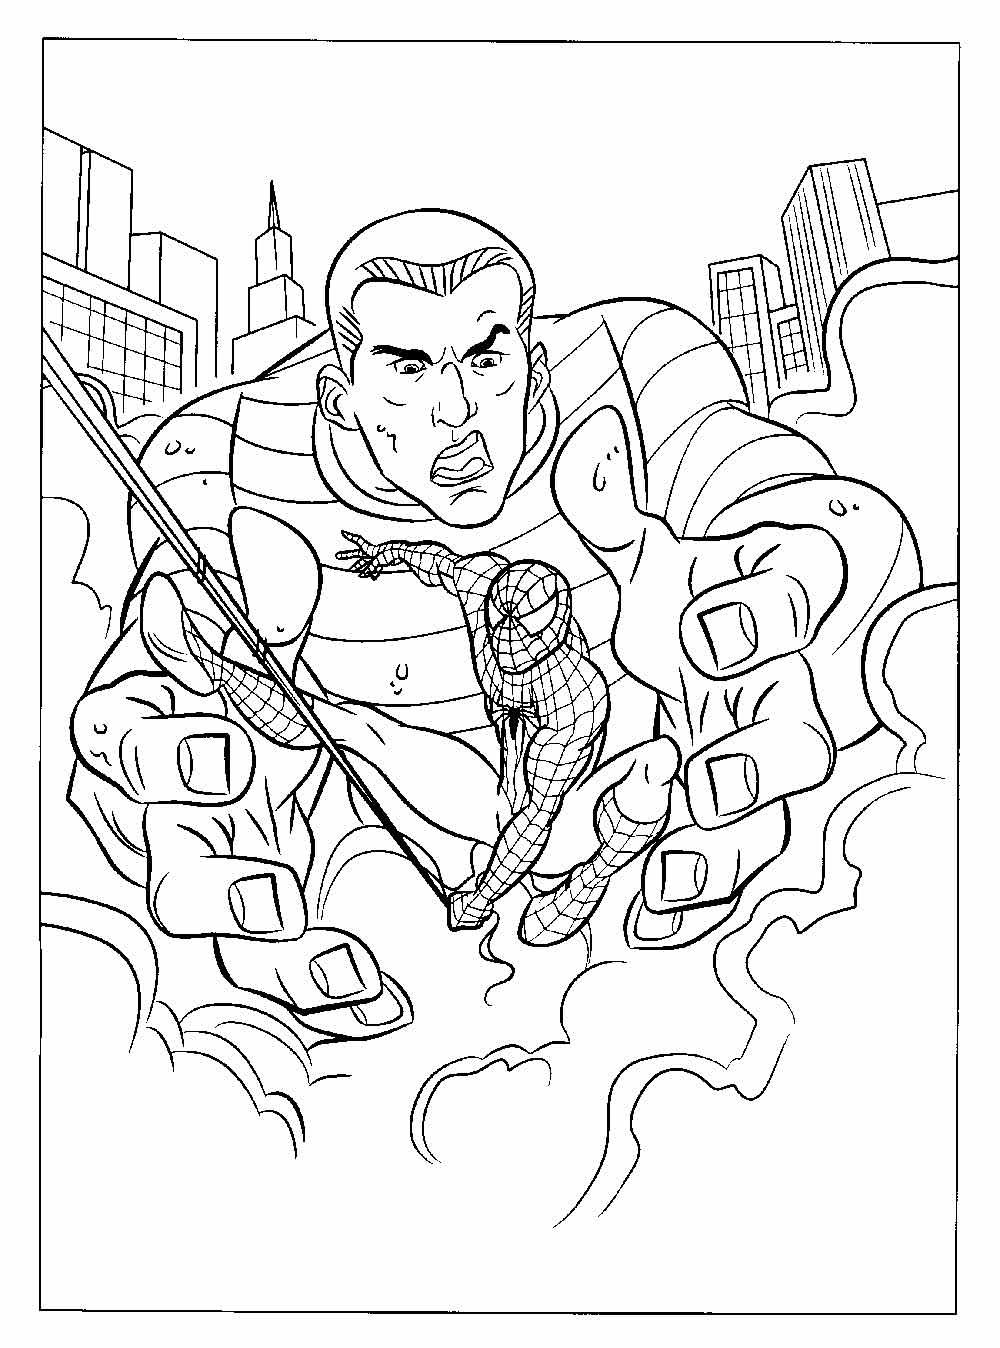 spiderman 3 coloring pages new goblin models | Раскраска Человек-паук 3 | Детские раскраски, распечатать ...